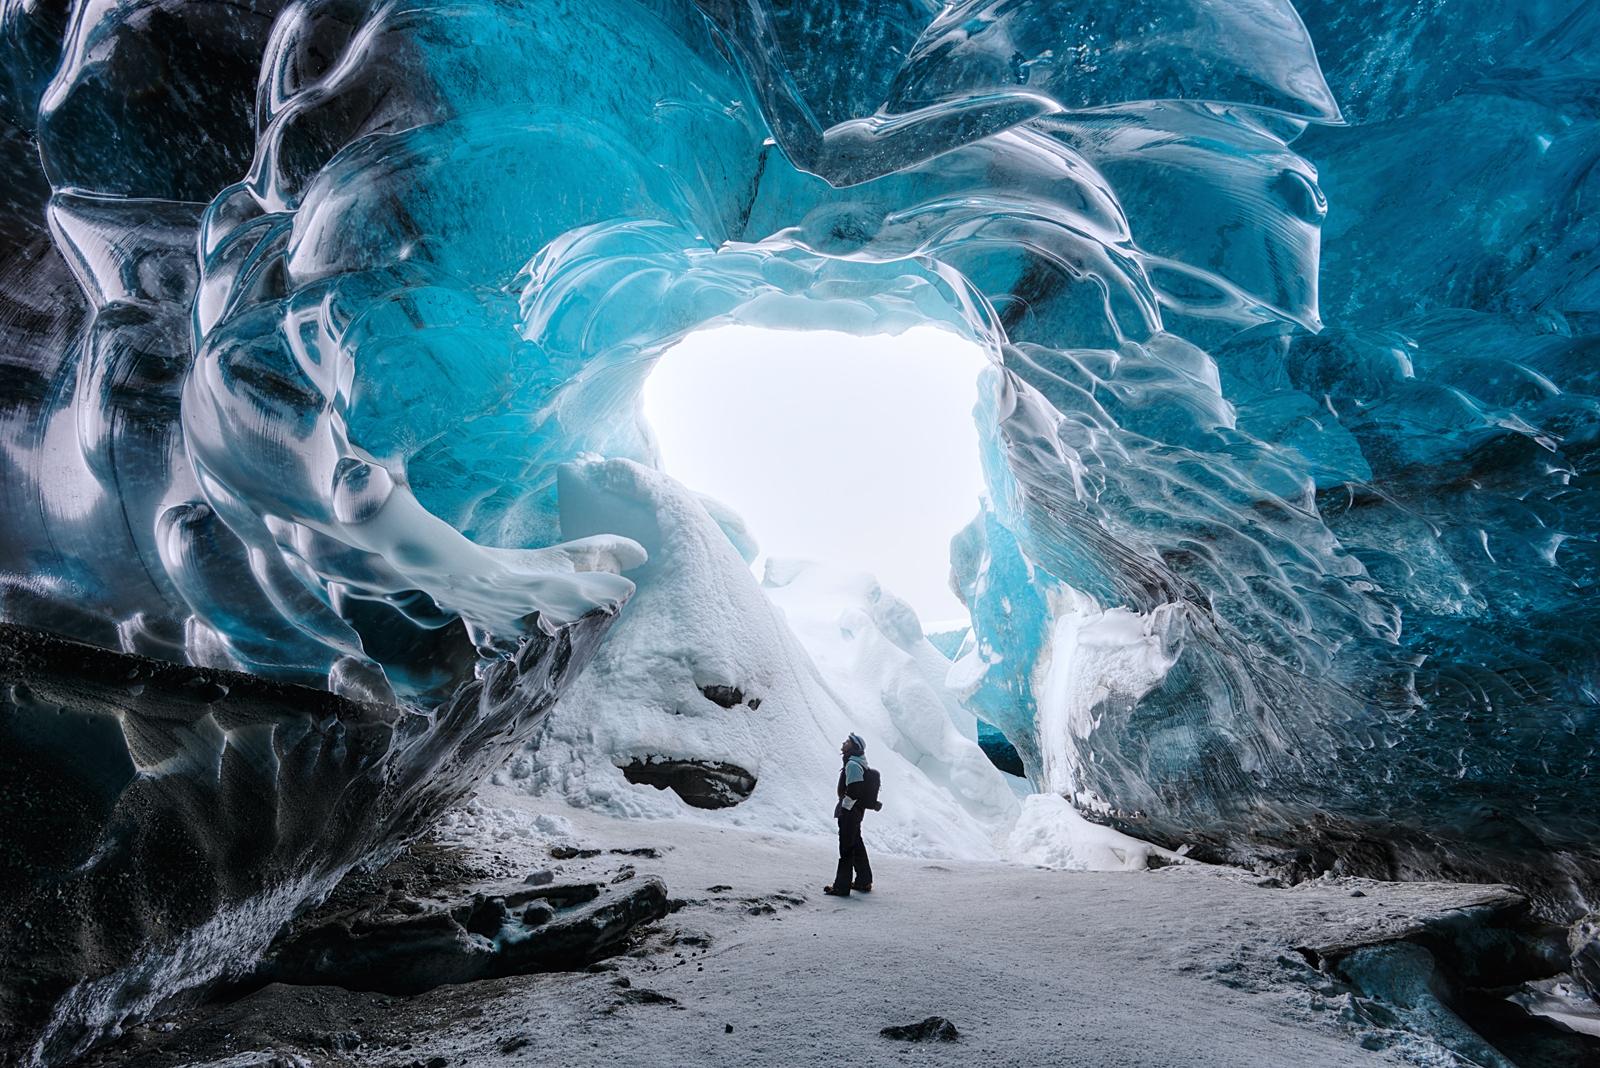 Vatnajökull Ice Cave, Iceland    Photograph by Shane Wheel